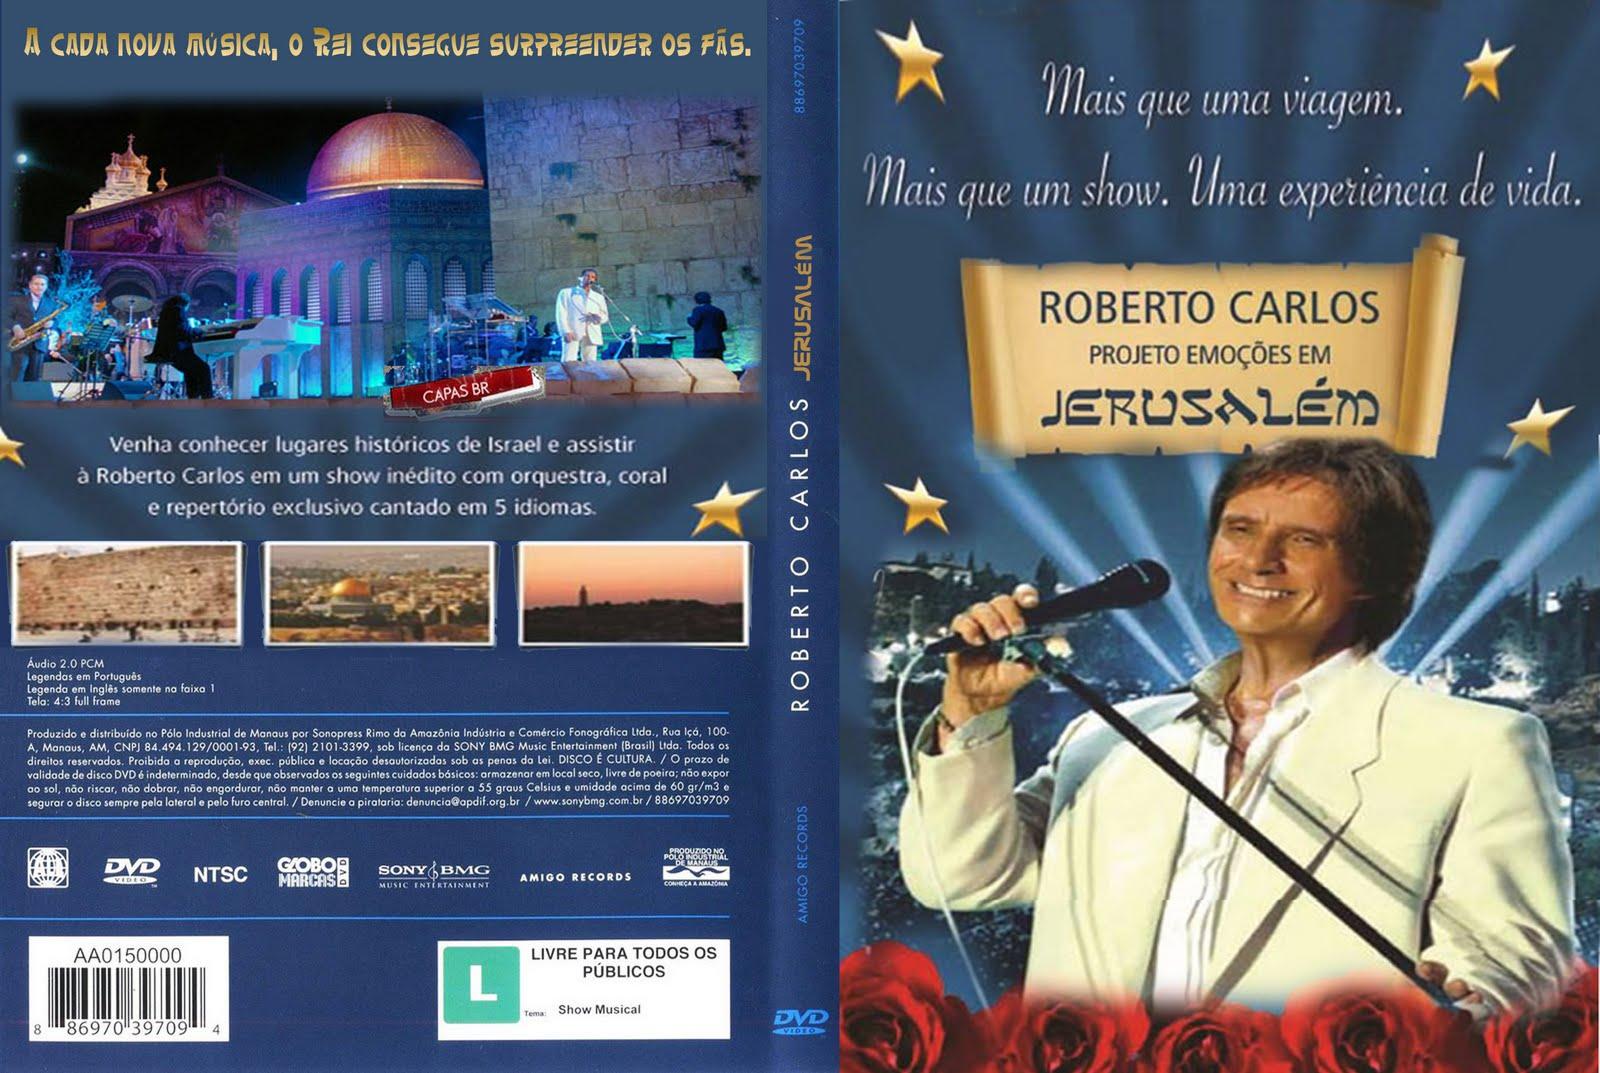 Roberto Carlos Especial em Jerusalém HDTV 720p Roberto 2BCarlos 2B 25E2 2580 2593 2BJerusal 25C3 25A9m